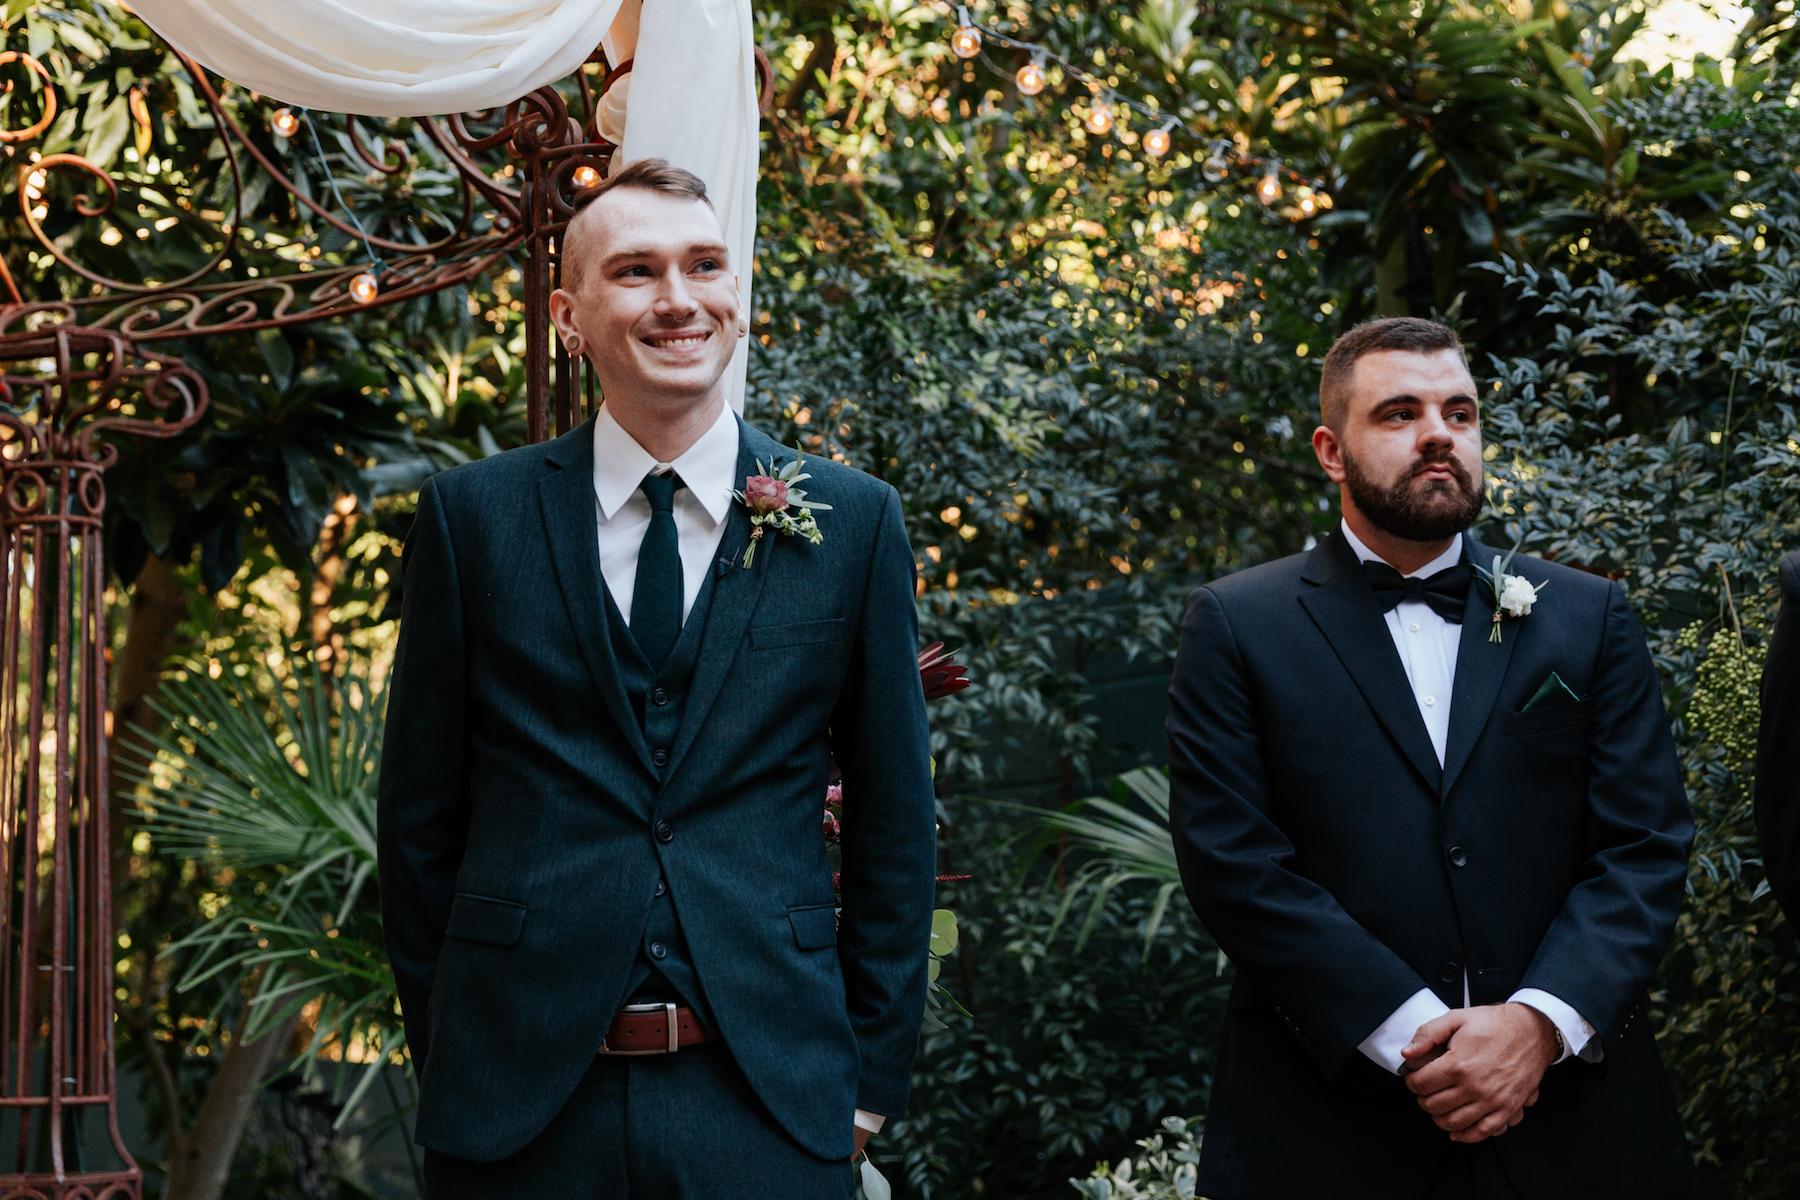 South-Carolina-Wedding-Engagement-Bridal-Photographer-Columbia-Greenville-Spartanburg-720.JPG